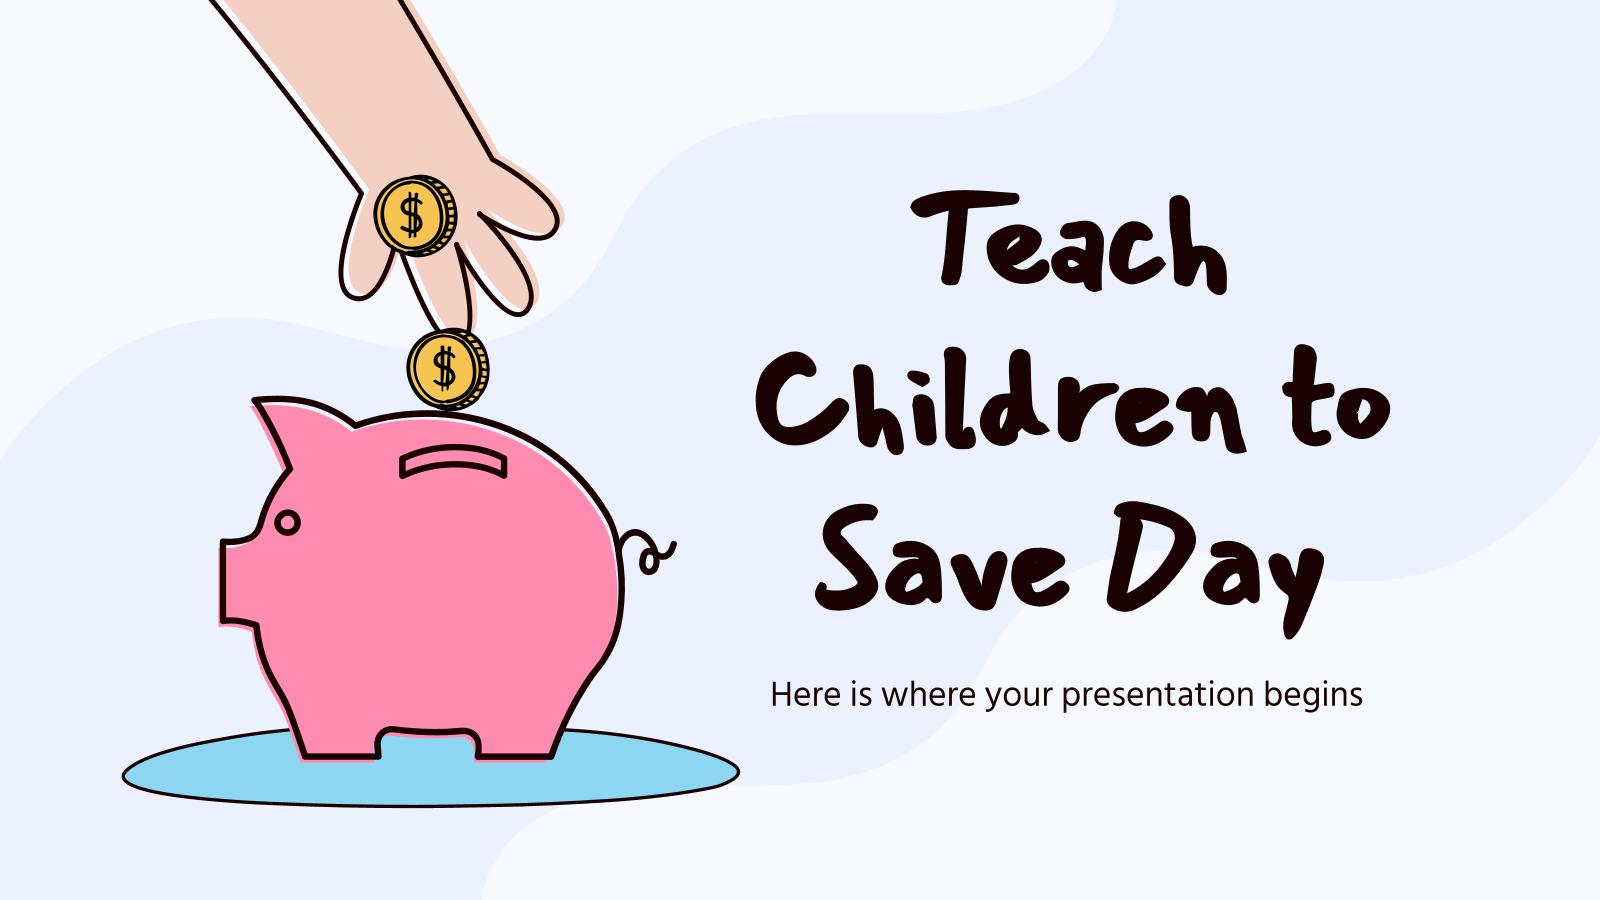 Teach Children to Save Day presentation template